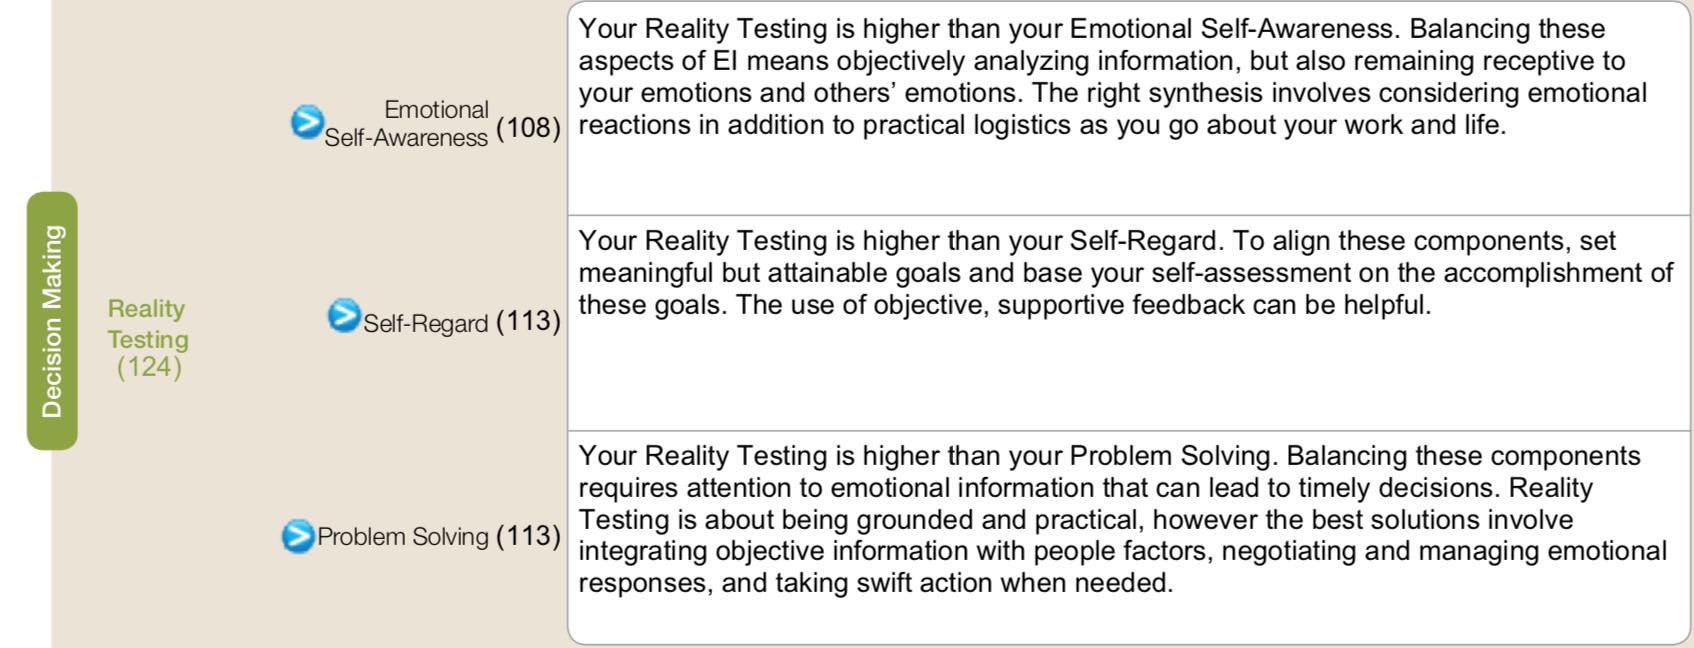 balancing-emotional-intelligence.png